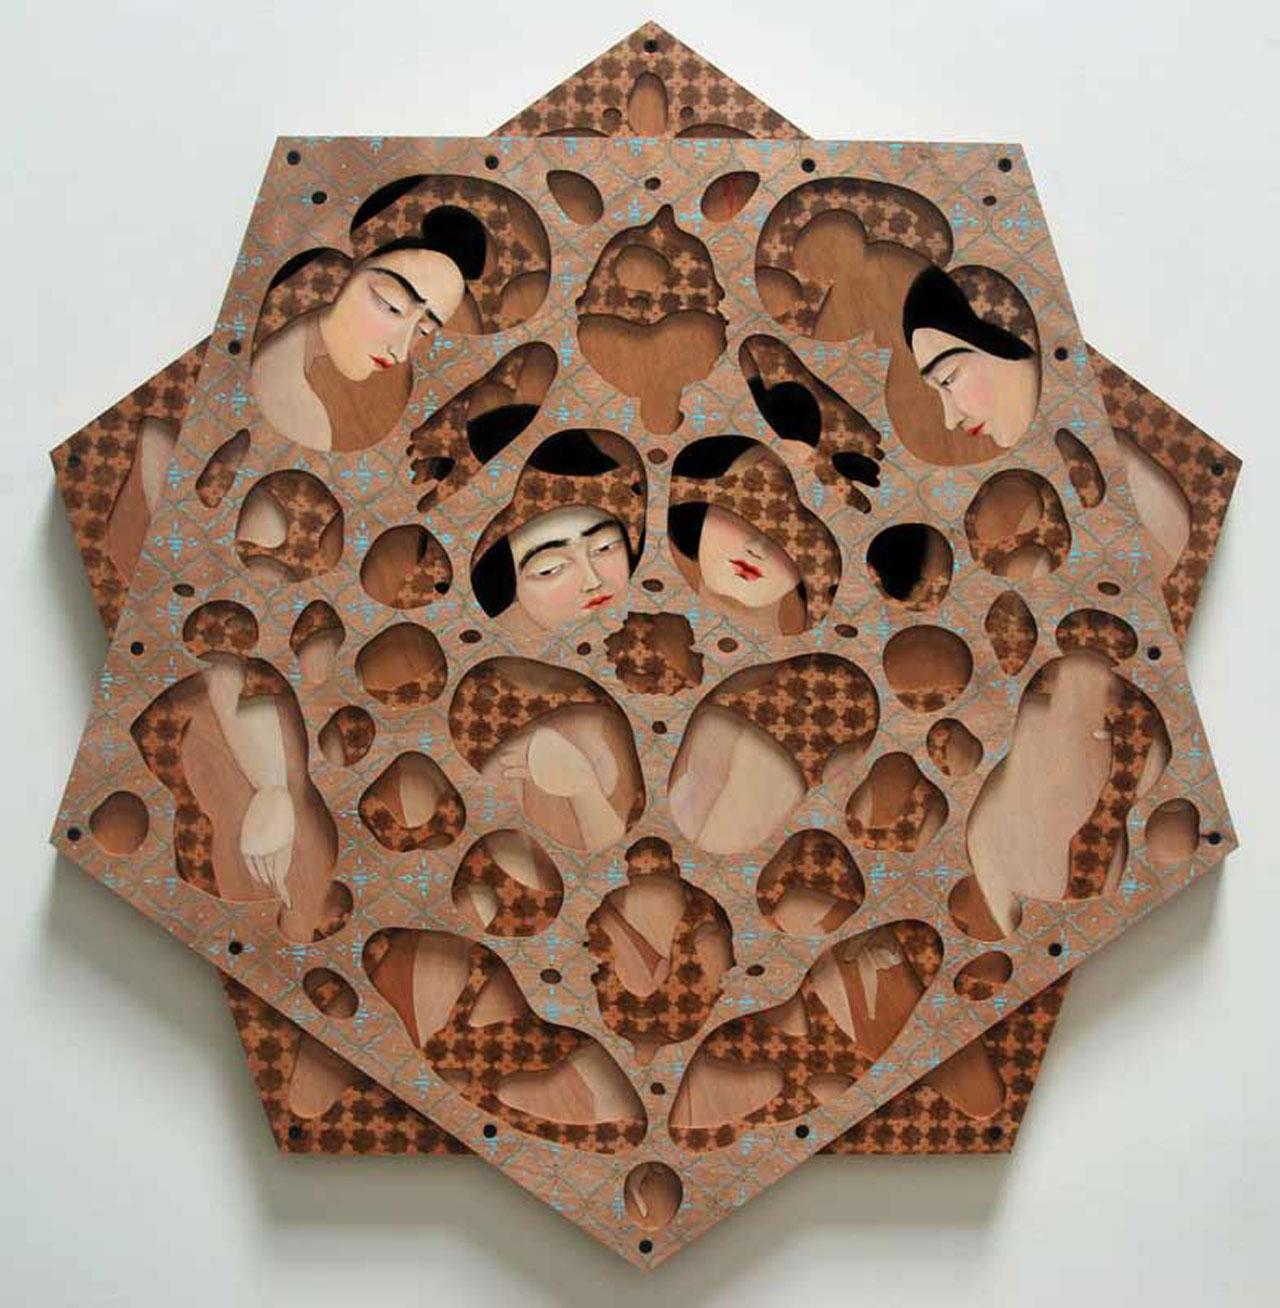 Hayv Kahraman, 'Decagram', 2013, Oil on panel, 127 cm Diameter. Courtesy the artist and The Third Line.